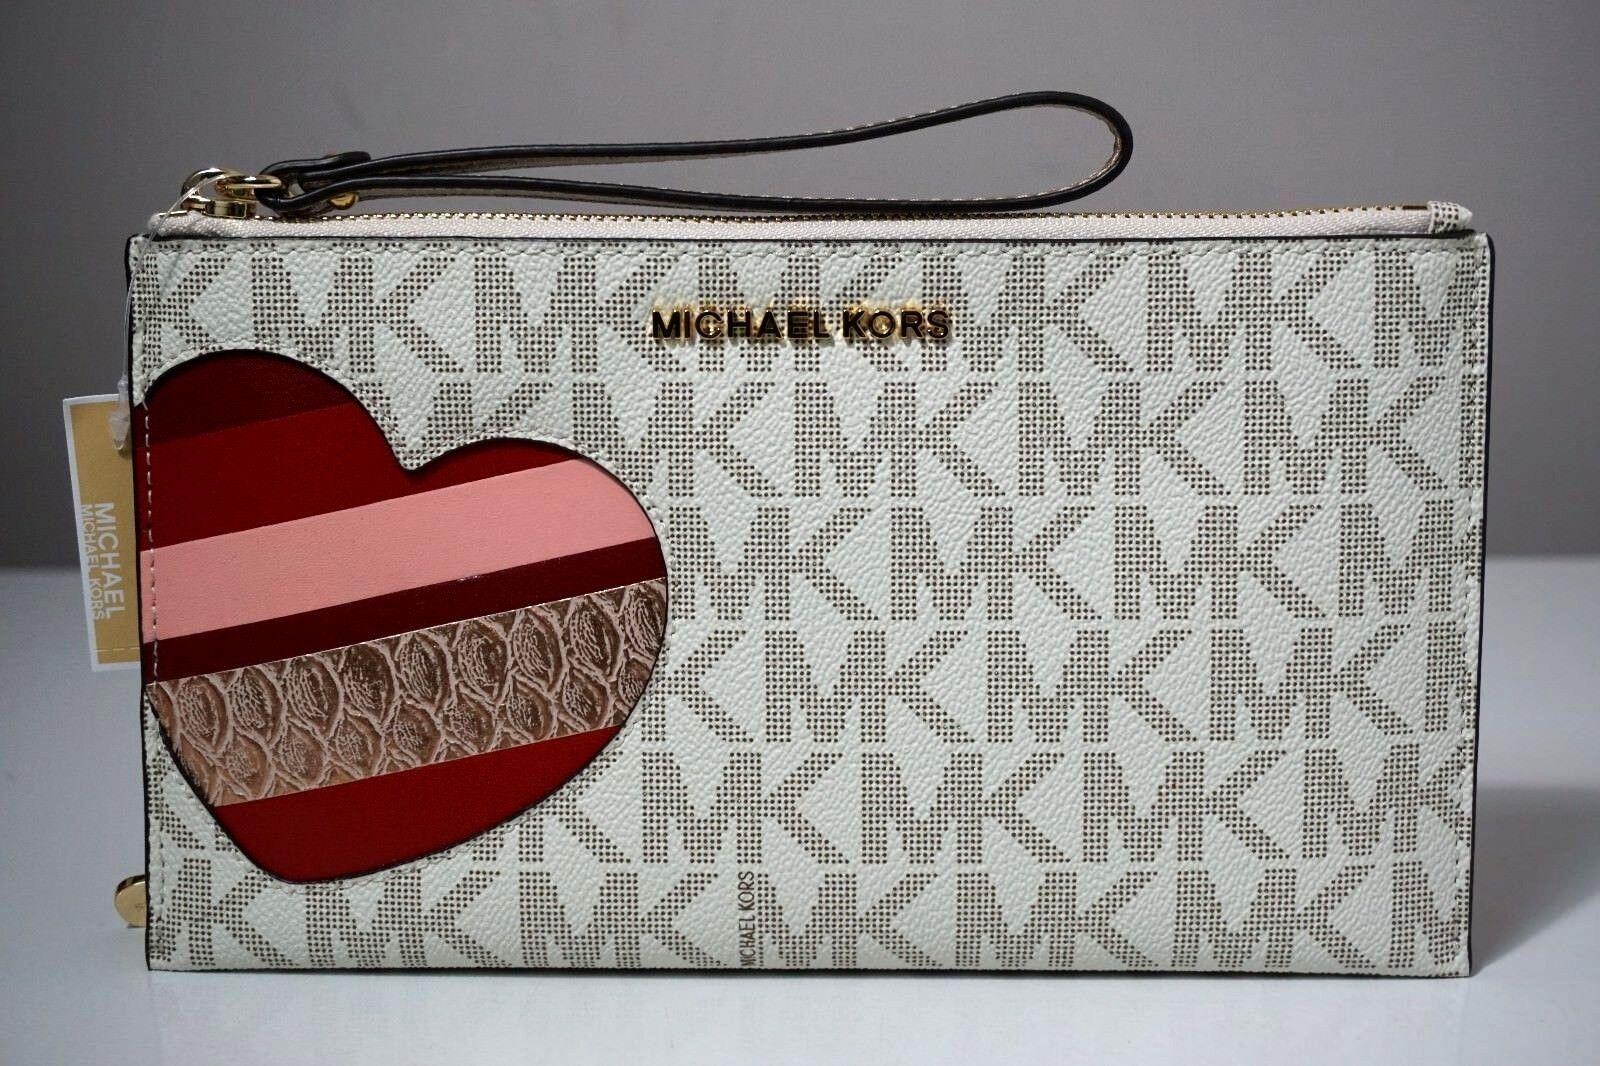 76626dfde75f Michael Kors Jet Set Signature Heart Vanilla/pale Gold Large Zip ...